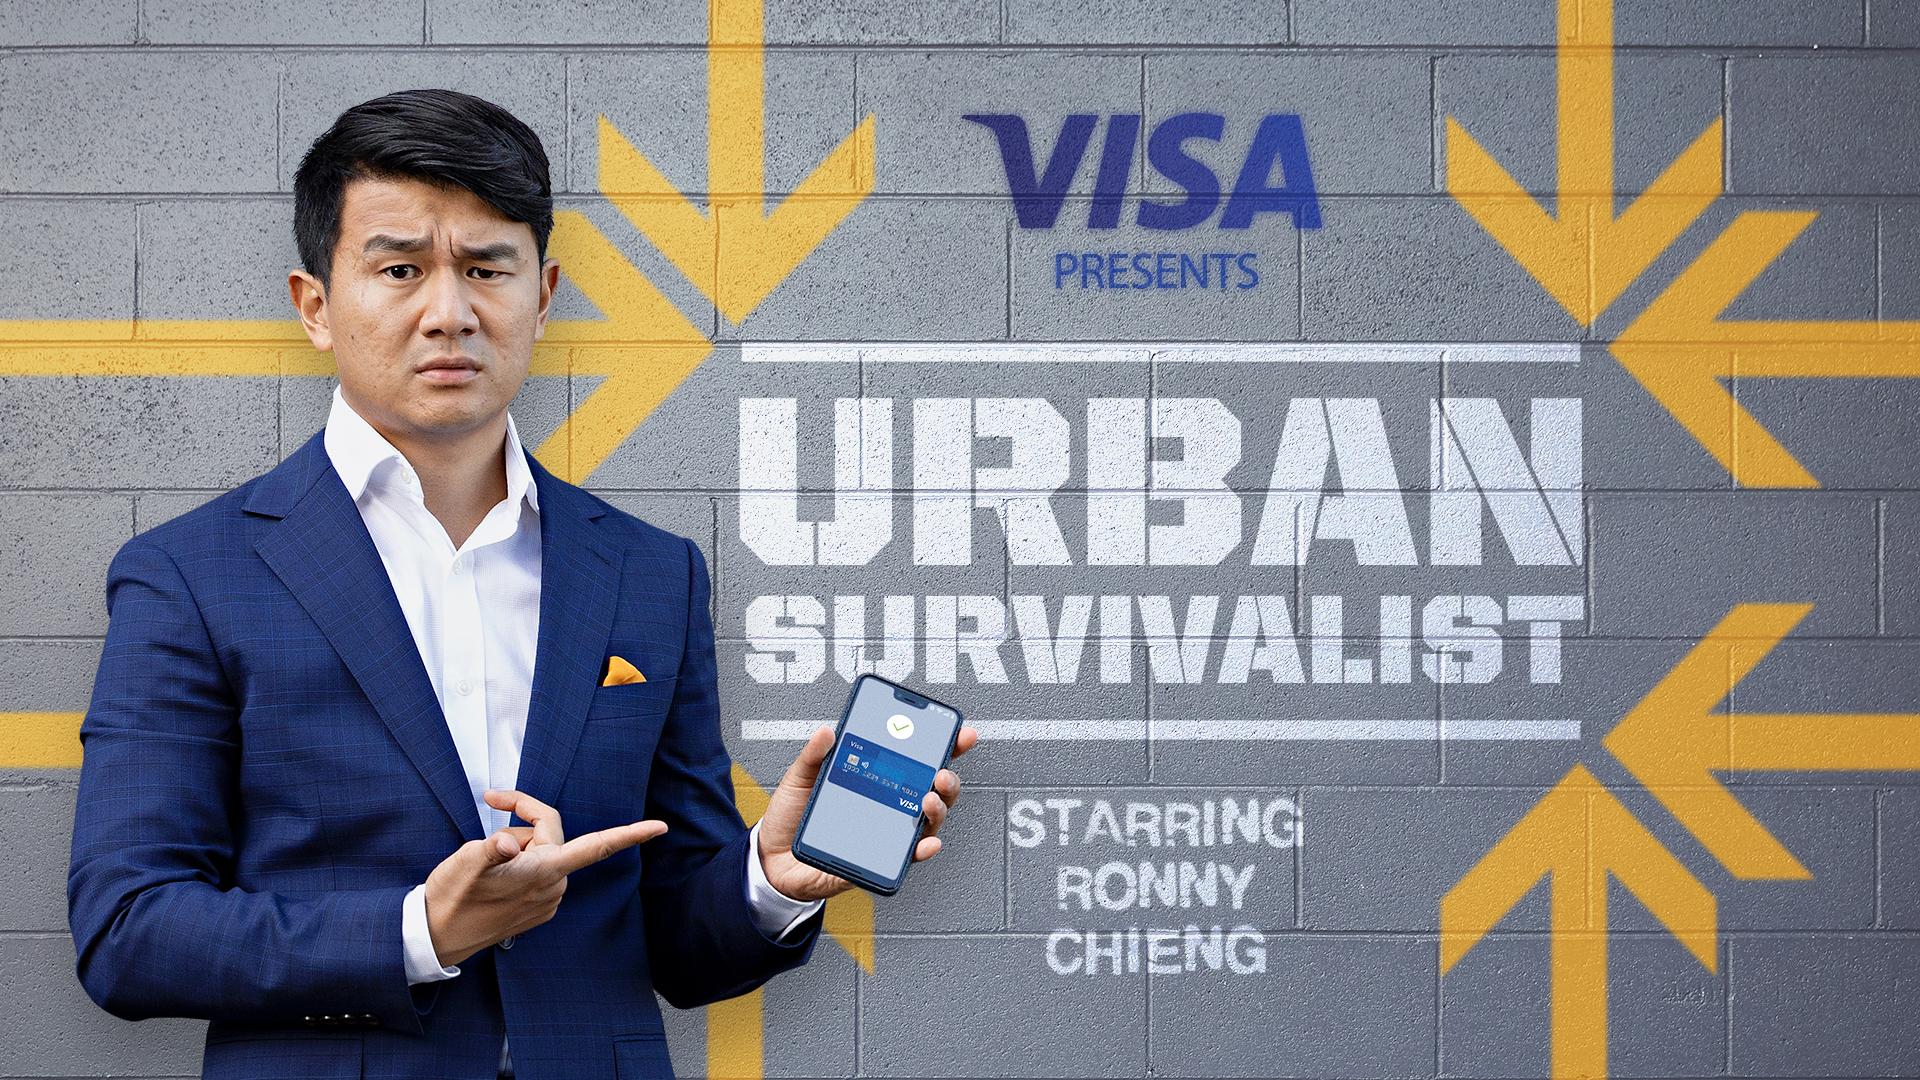 visa_-_urban_survivalist.jpg